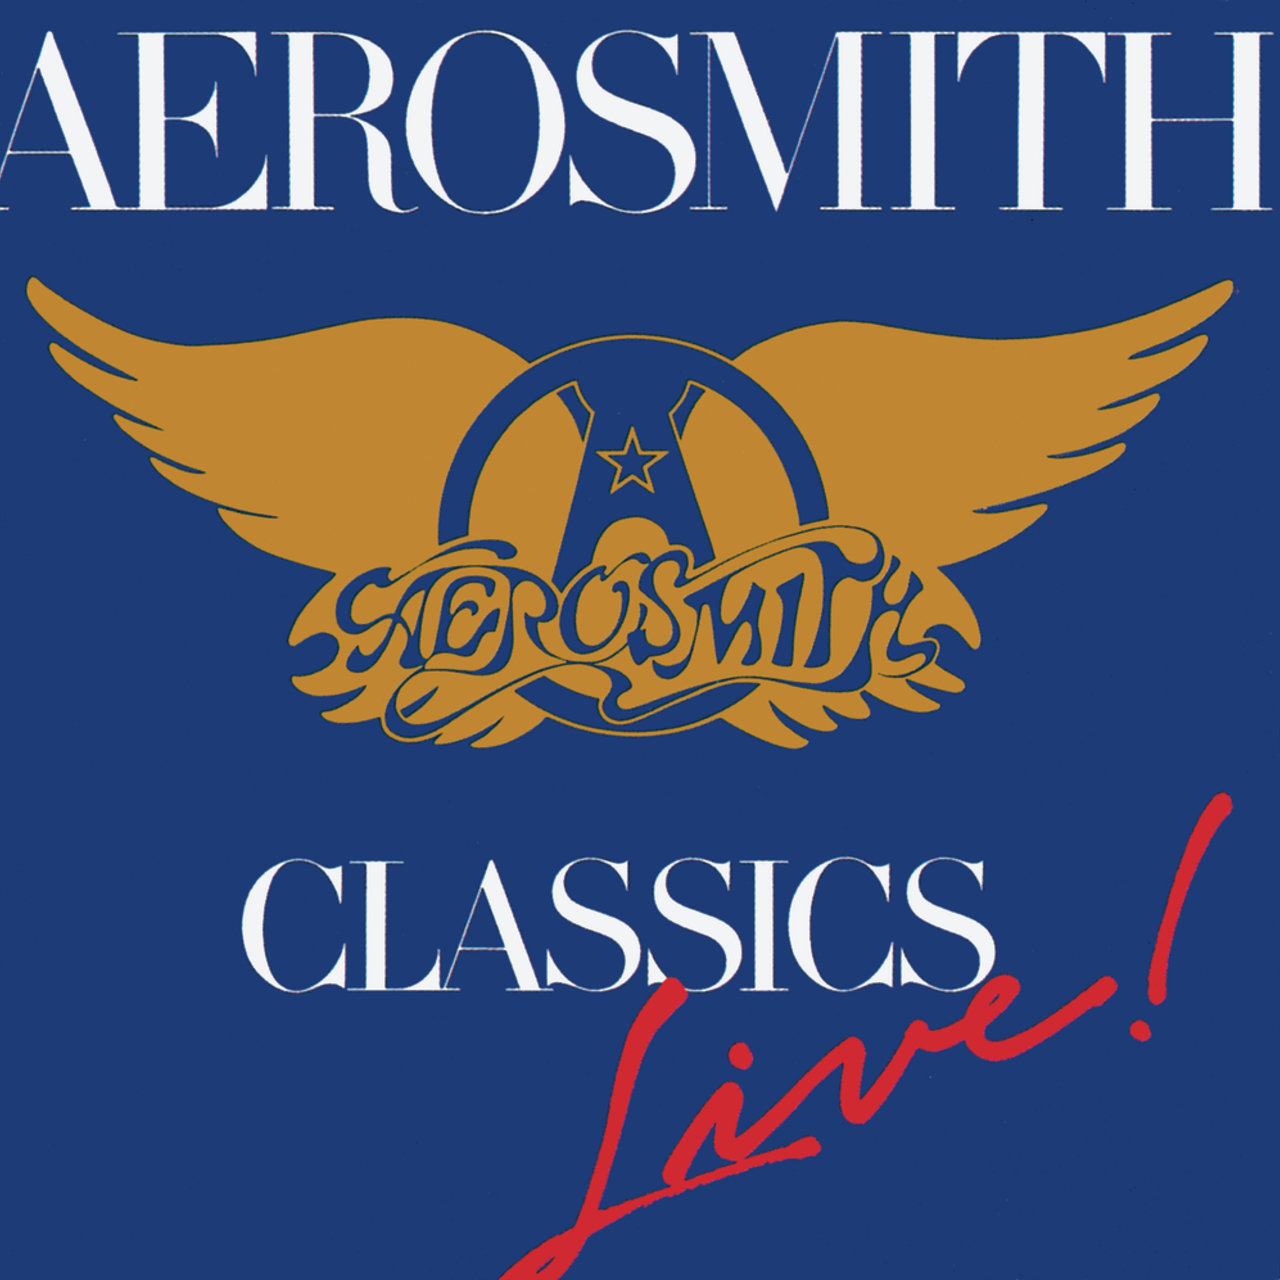 Aerosmith Classics Live